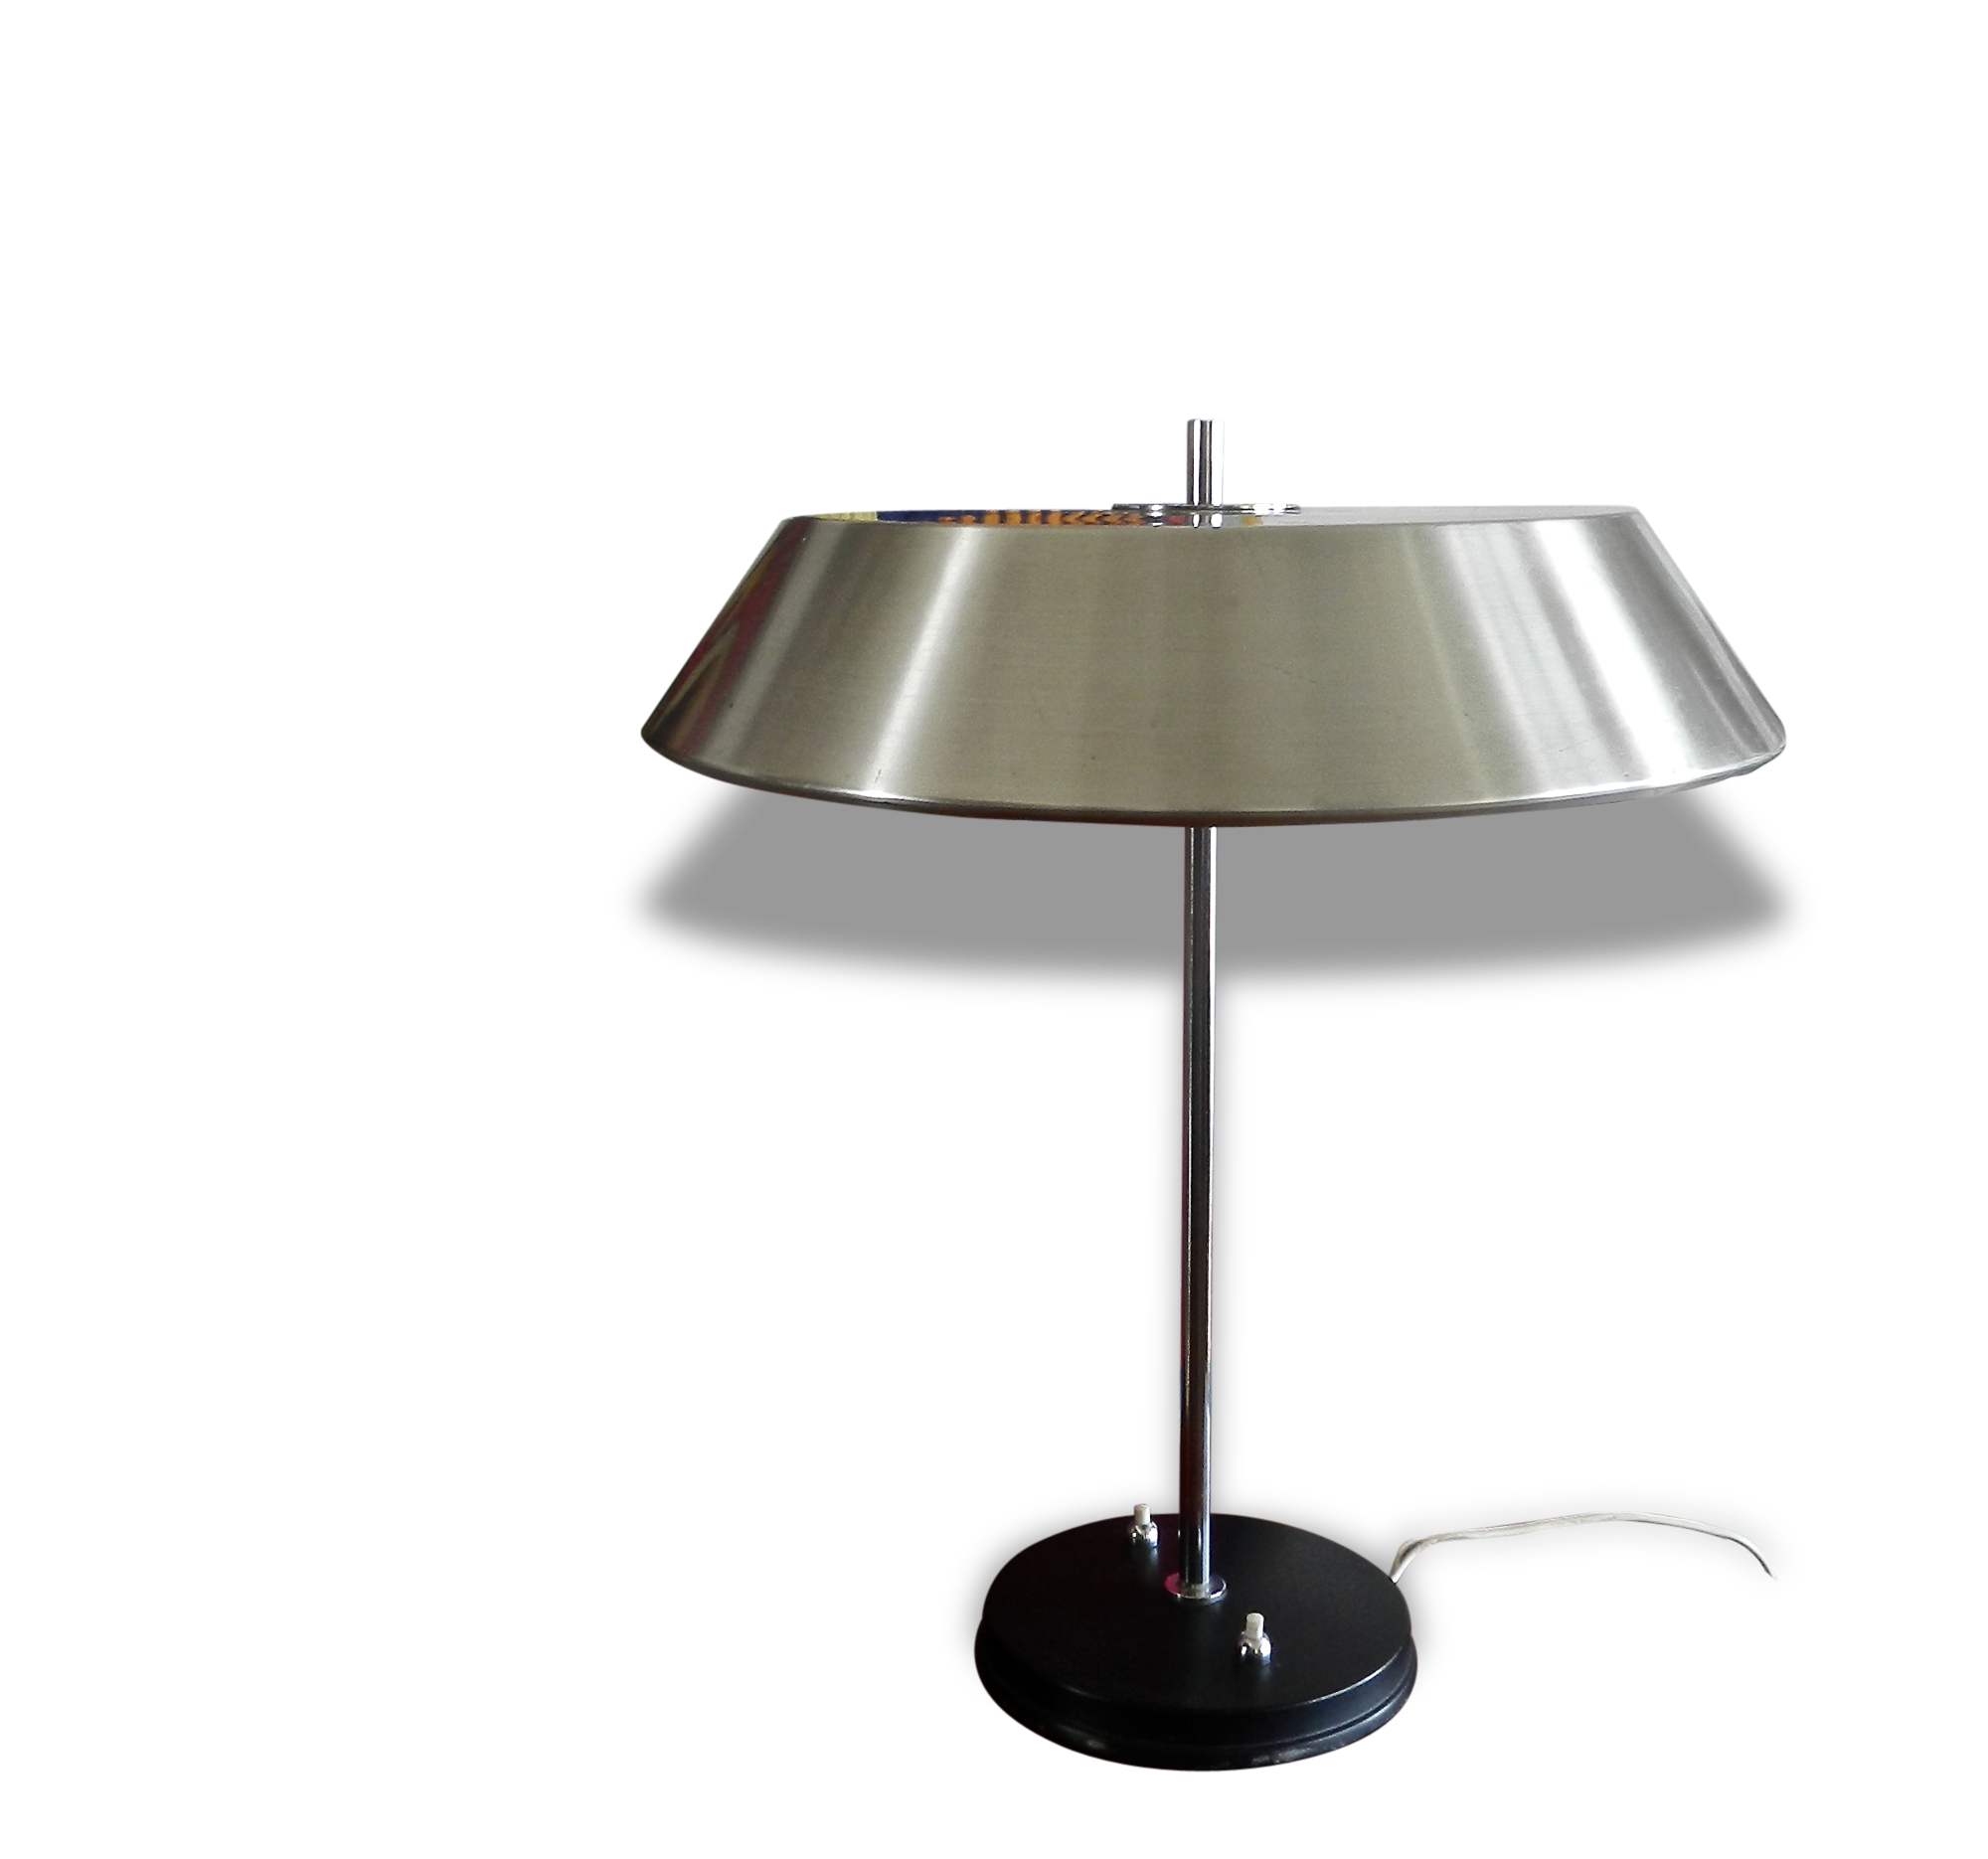 Lampe Vintage Cheap Lampen Tischlampen Retro Lampe Vintage